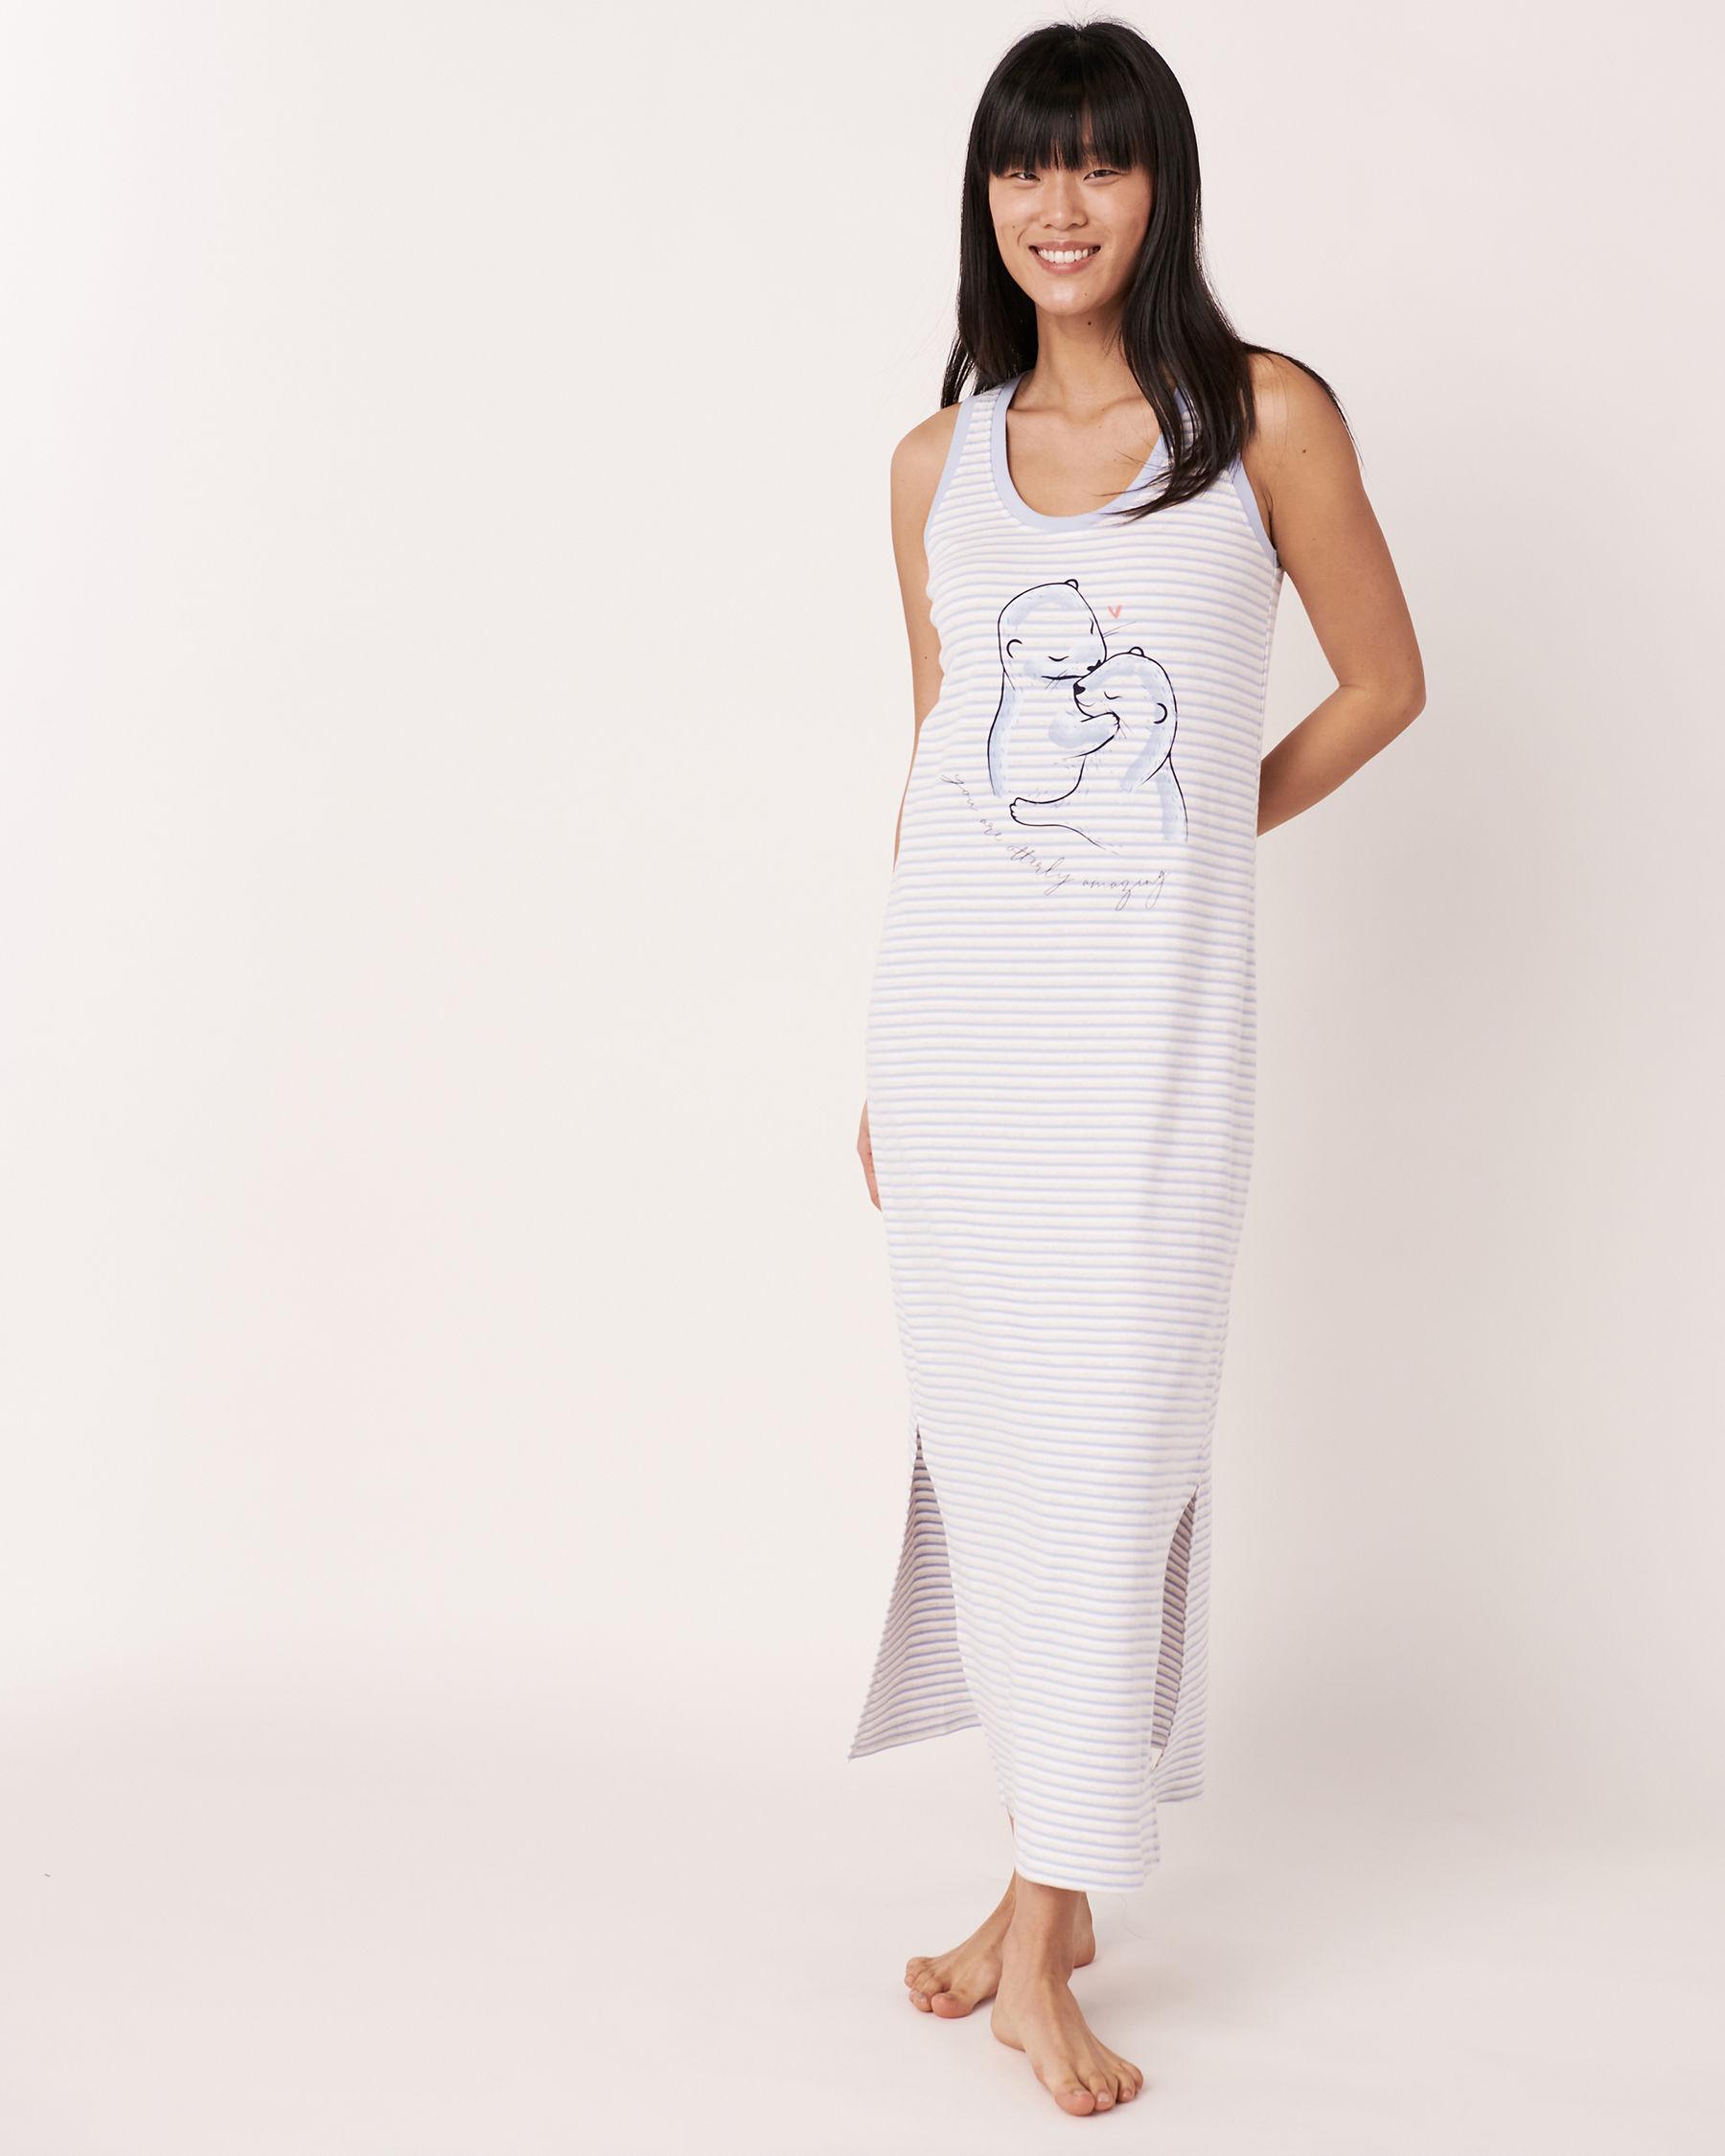 LA VIE EN ROSE Organic Cotton Sleeveless Long Sleepshirt Blue and white stripes 40500002 - View2